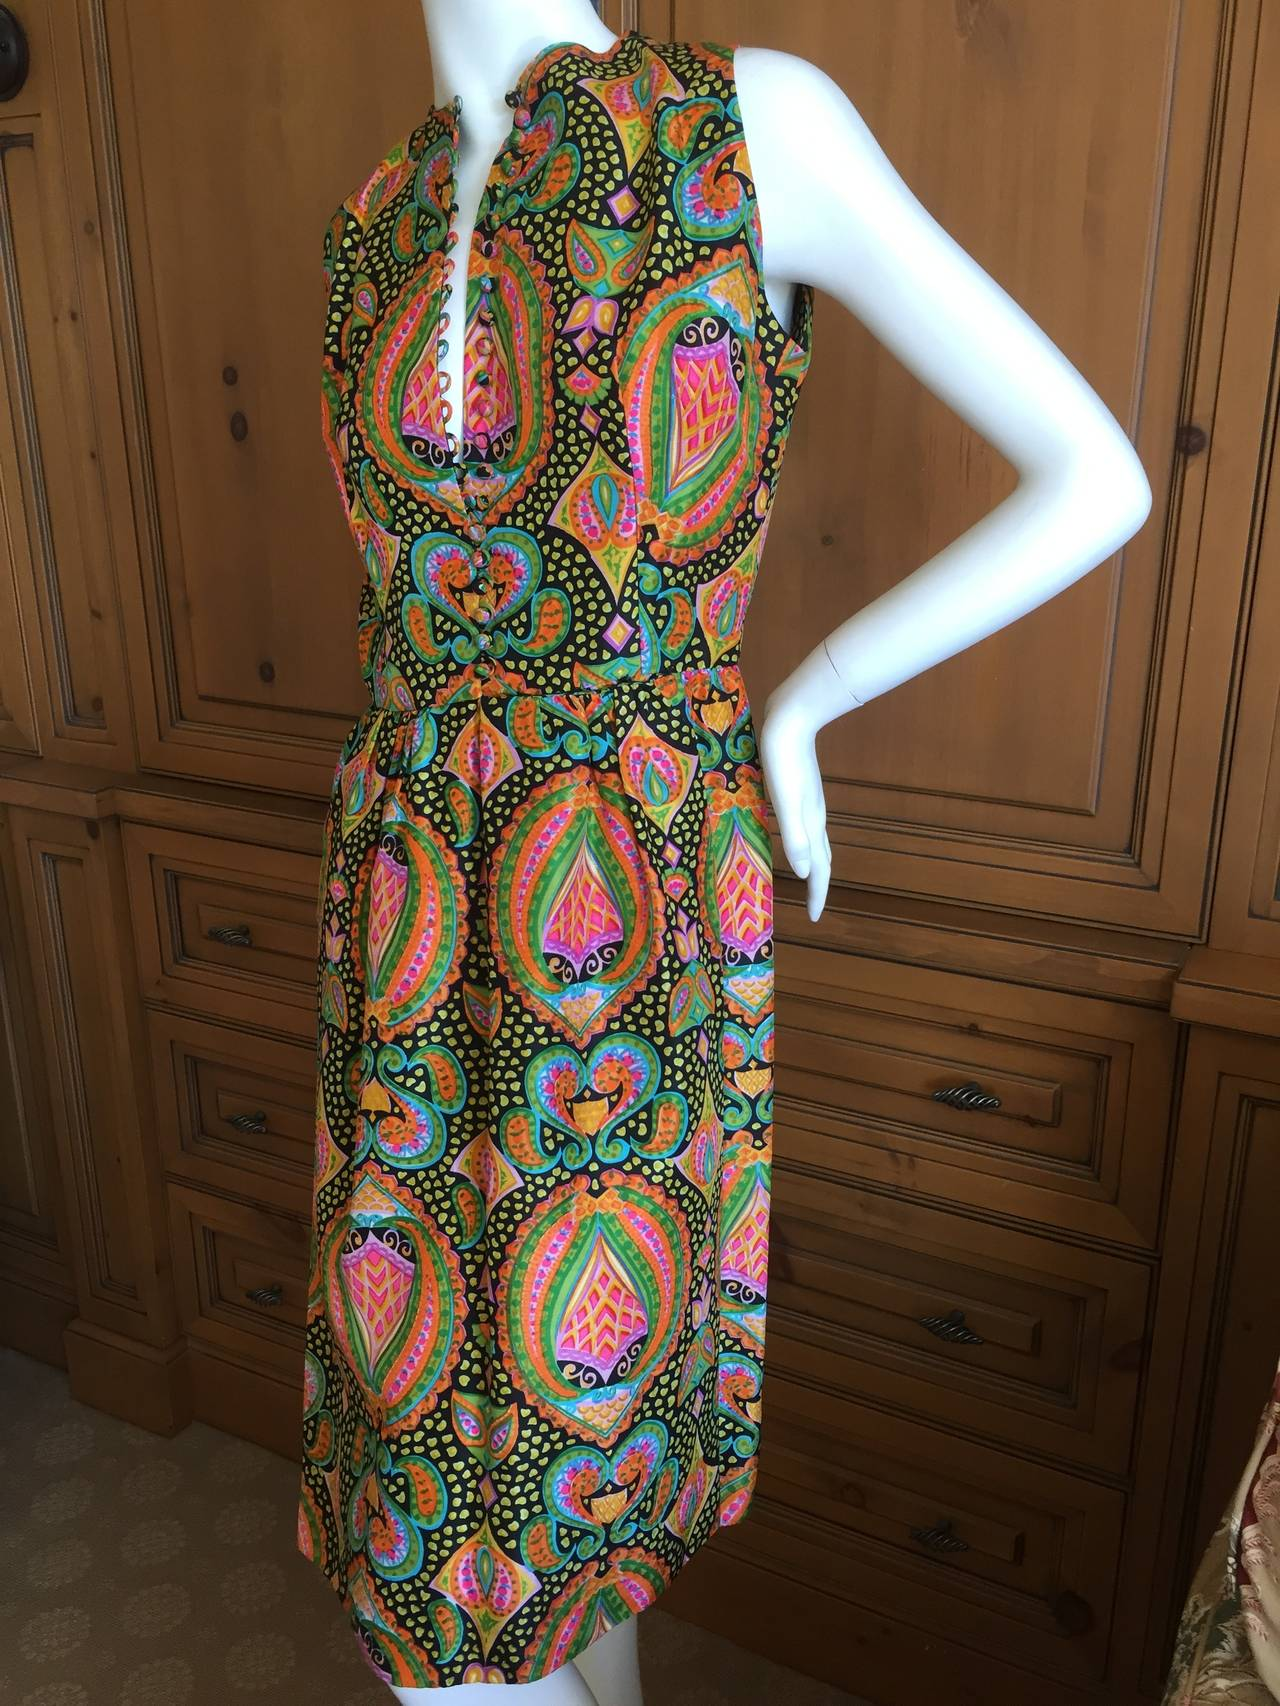 Geoffrey Beene 1970's Sleeveless Silk Dress with Sash 6